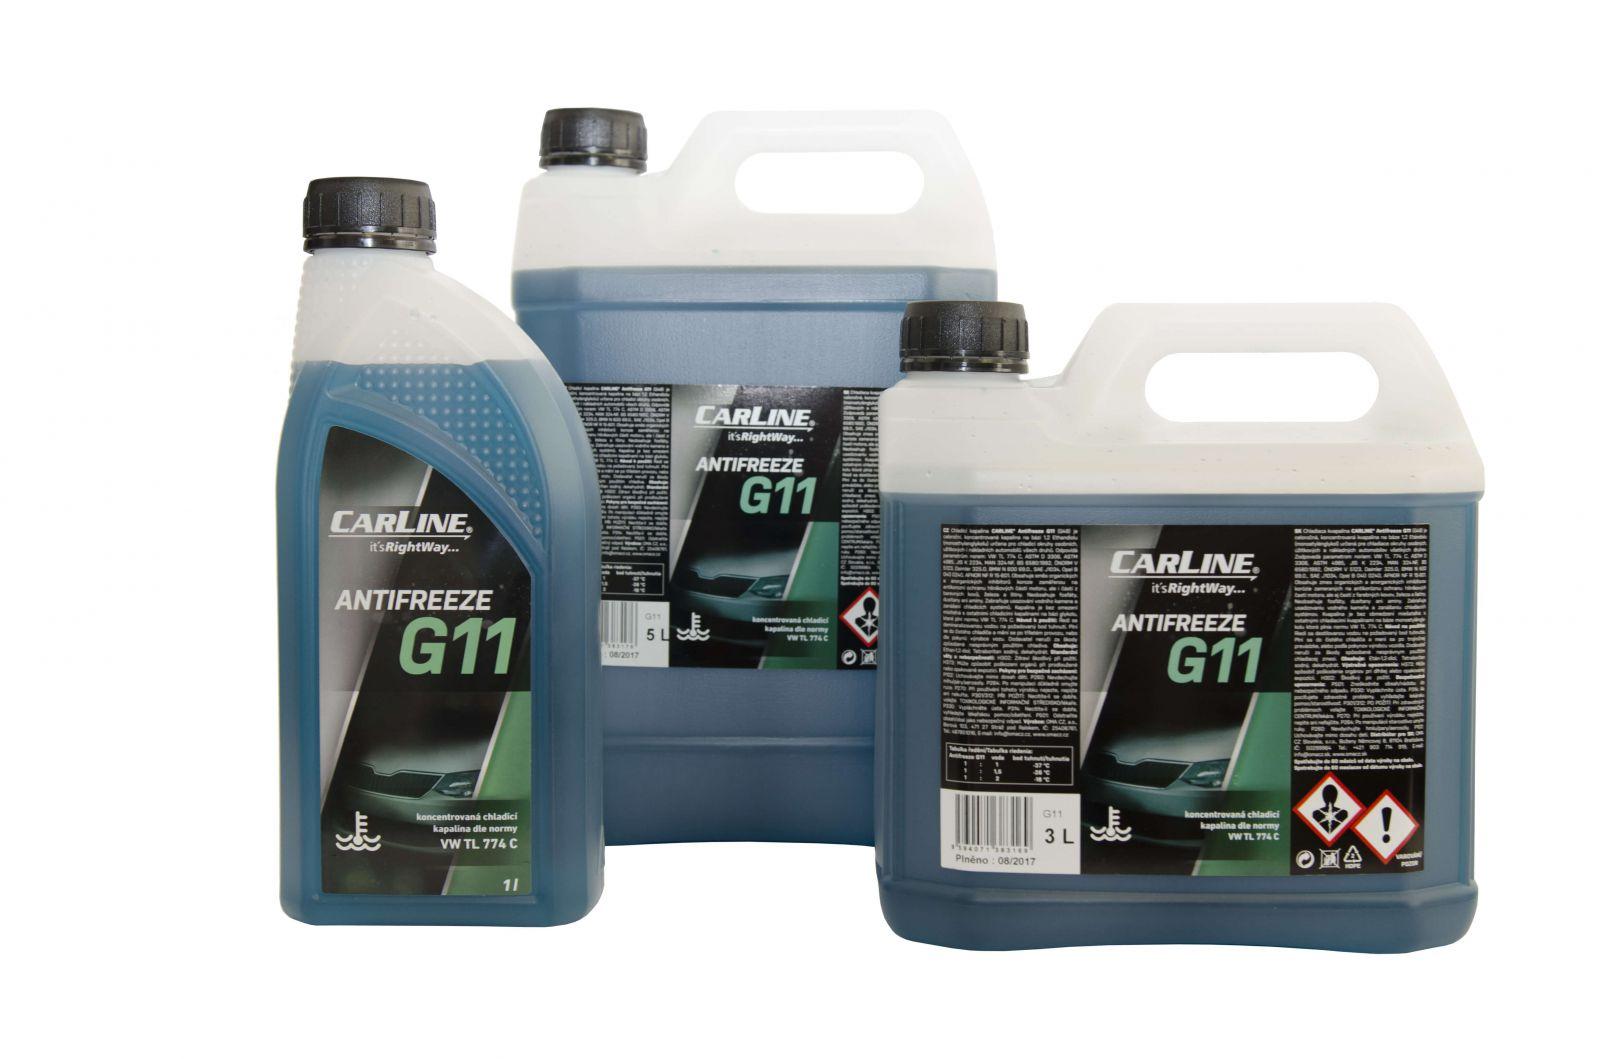 Carline Antifreeze G11 (G48) 1 L